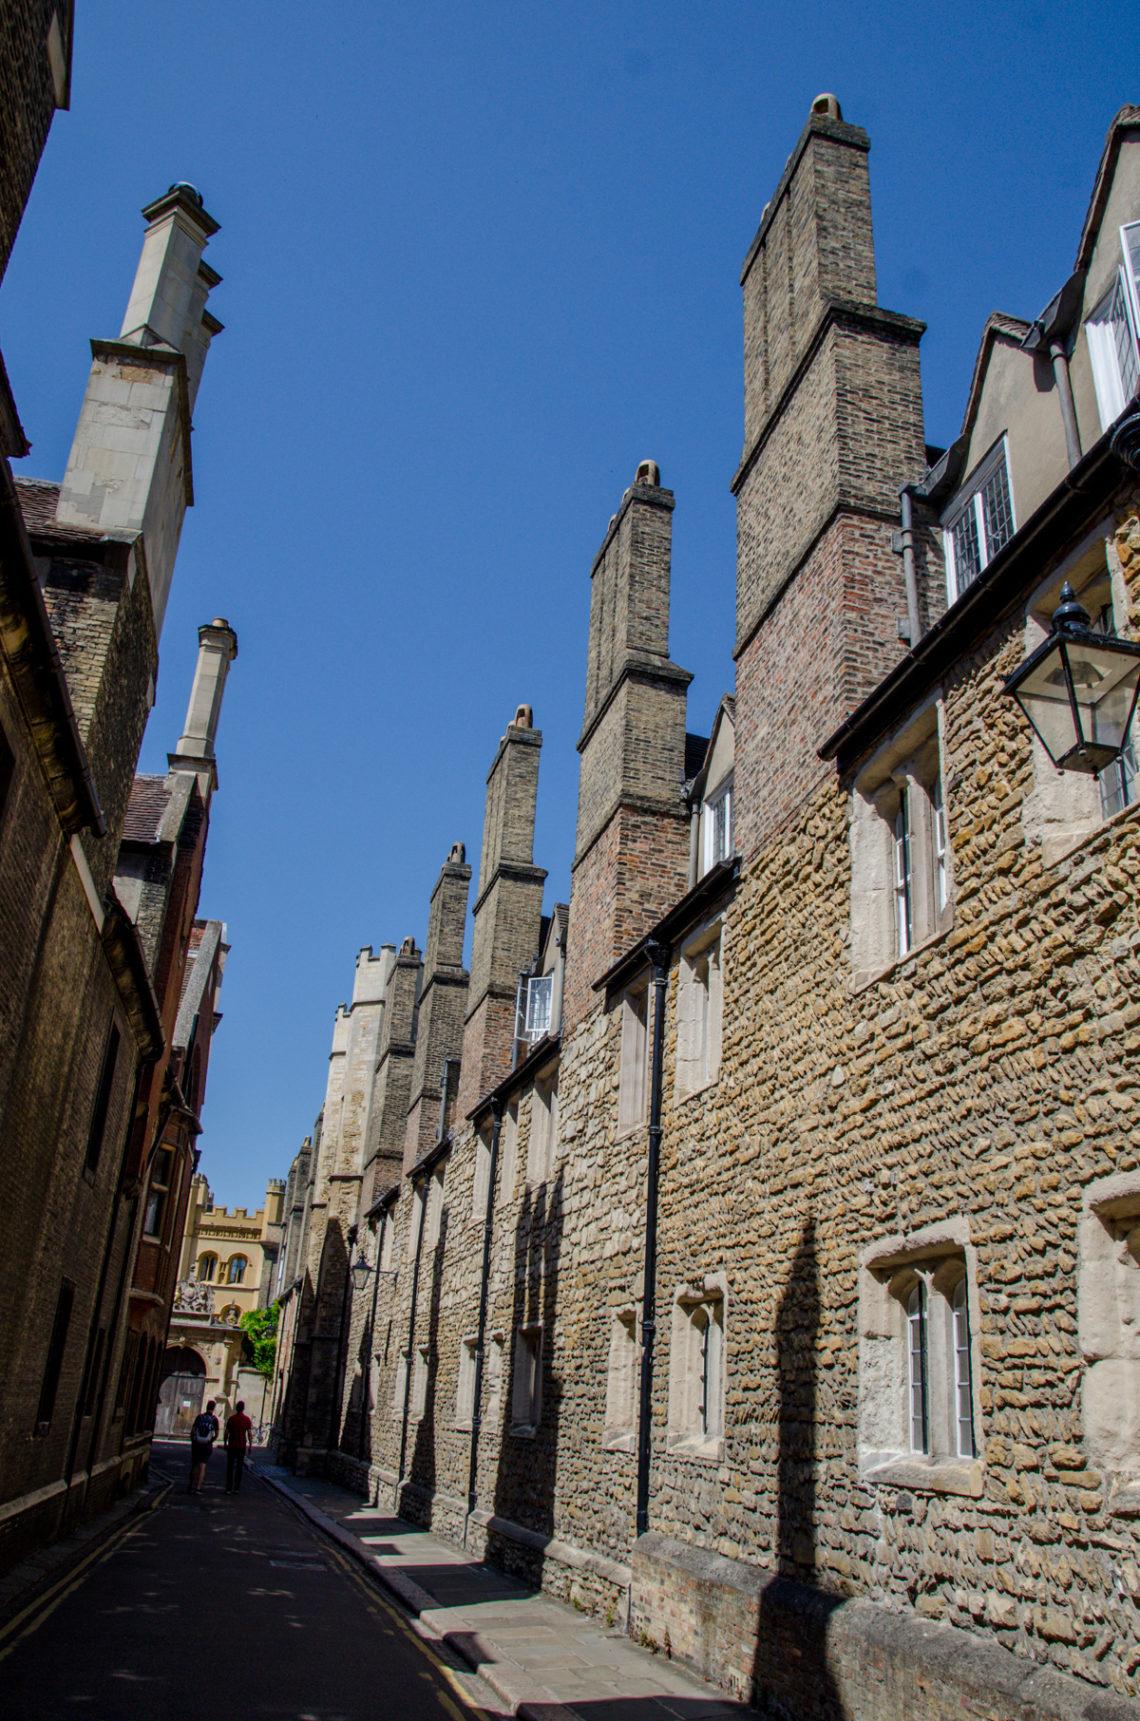 Rue avec hauts bâtiments en pierre